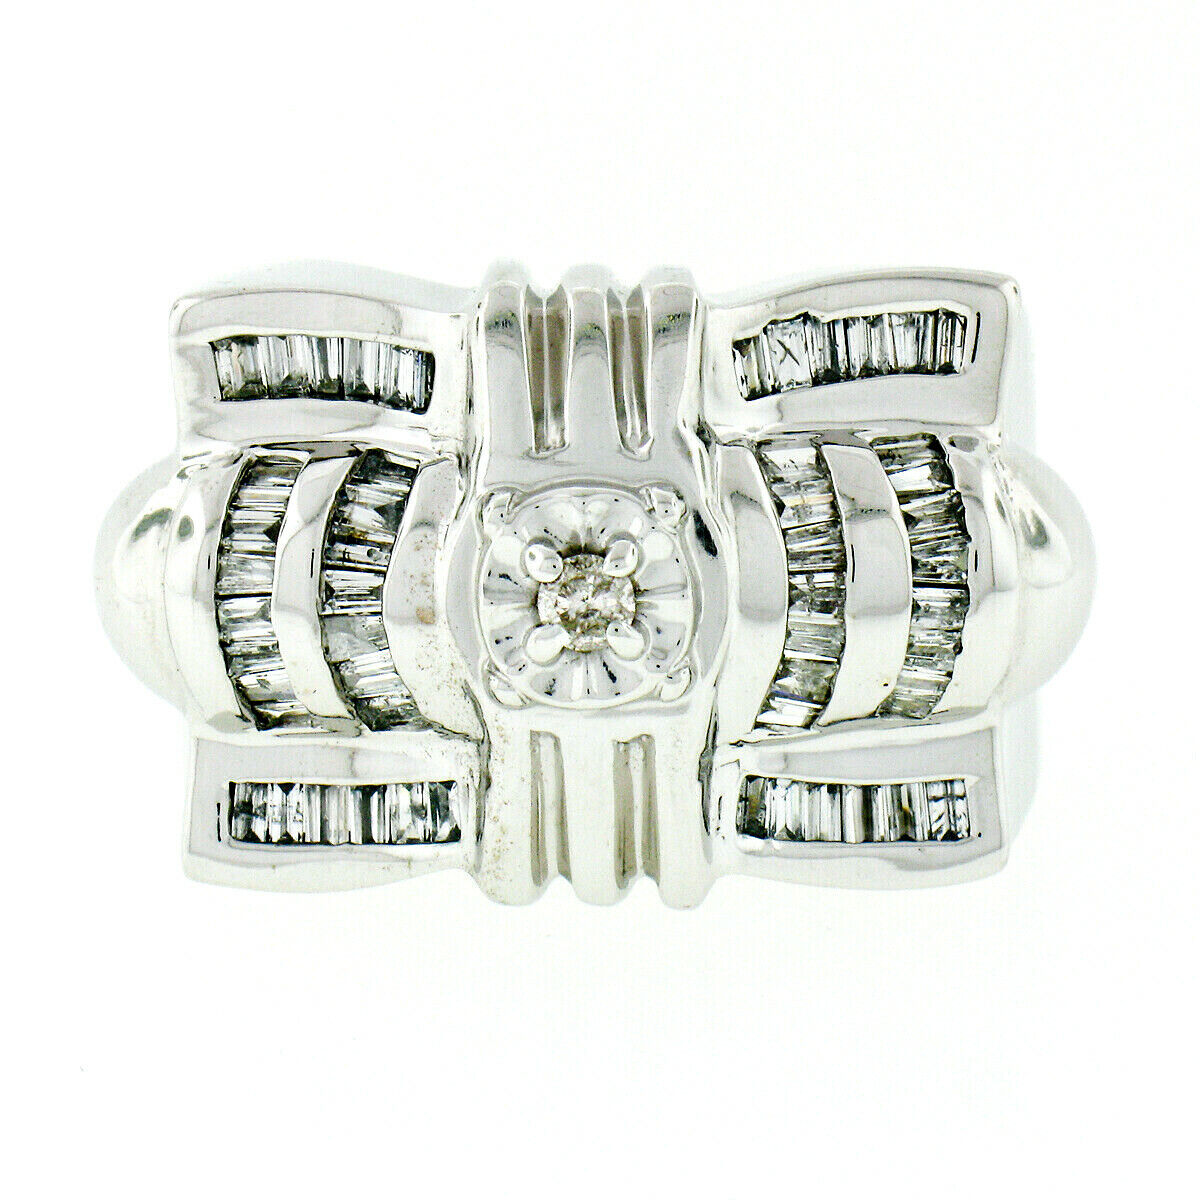 Stravaganti da Uomo 14k 14k 14k oro Bianco 1.14ctw rossoondo & Baguette Diamante Grande 863156